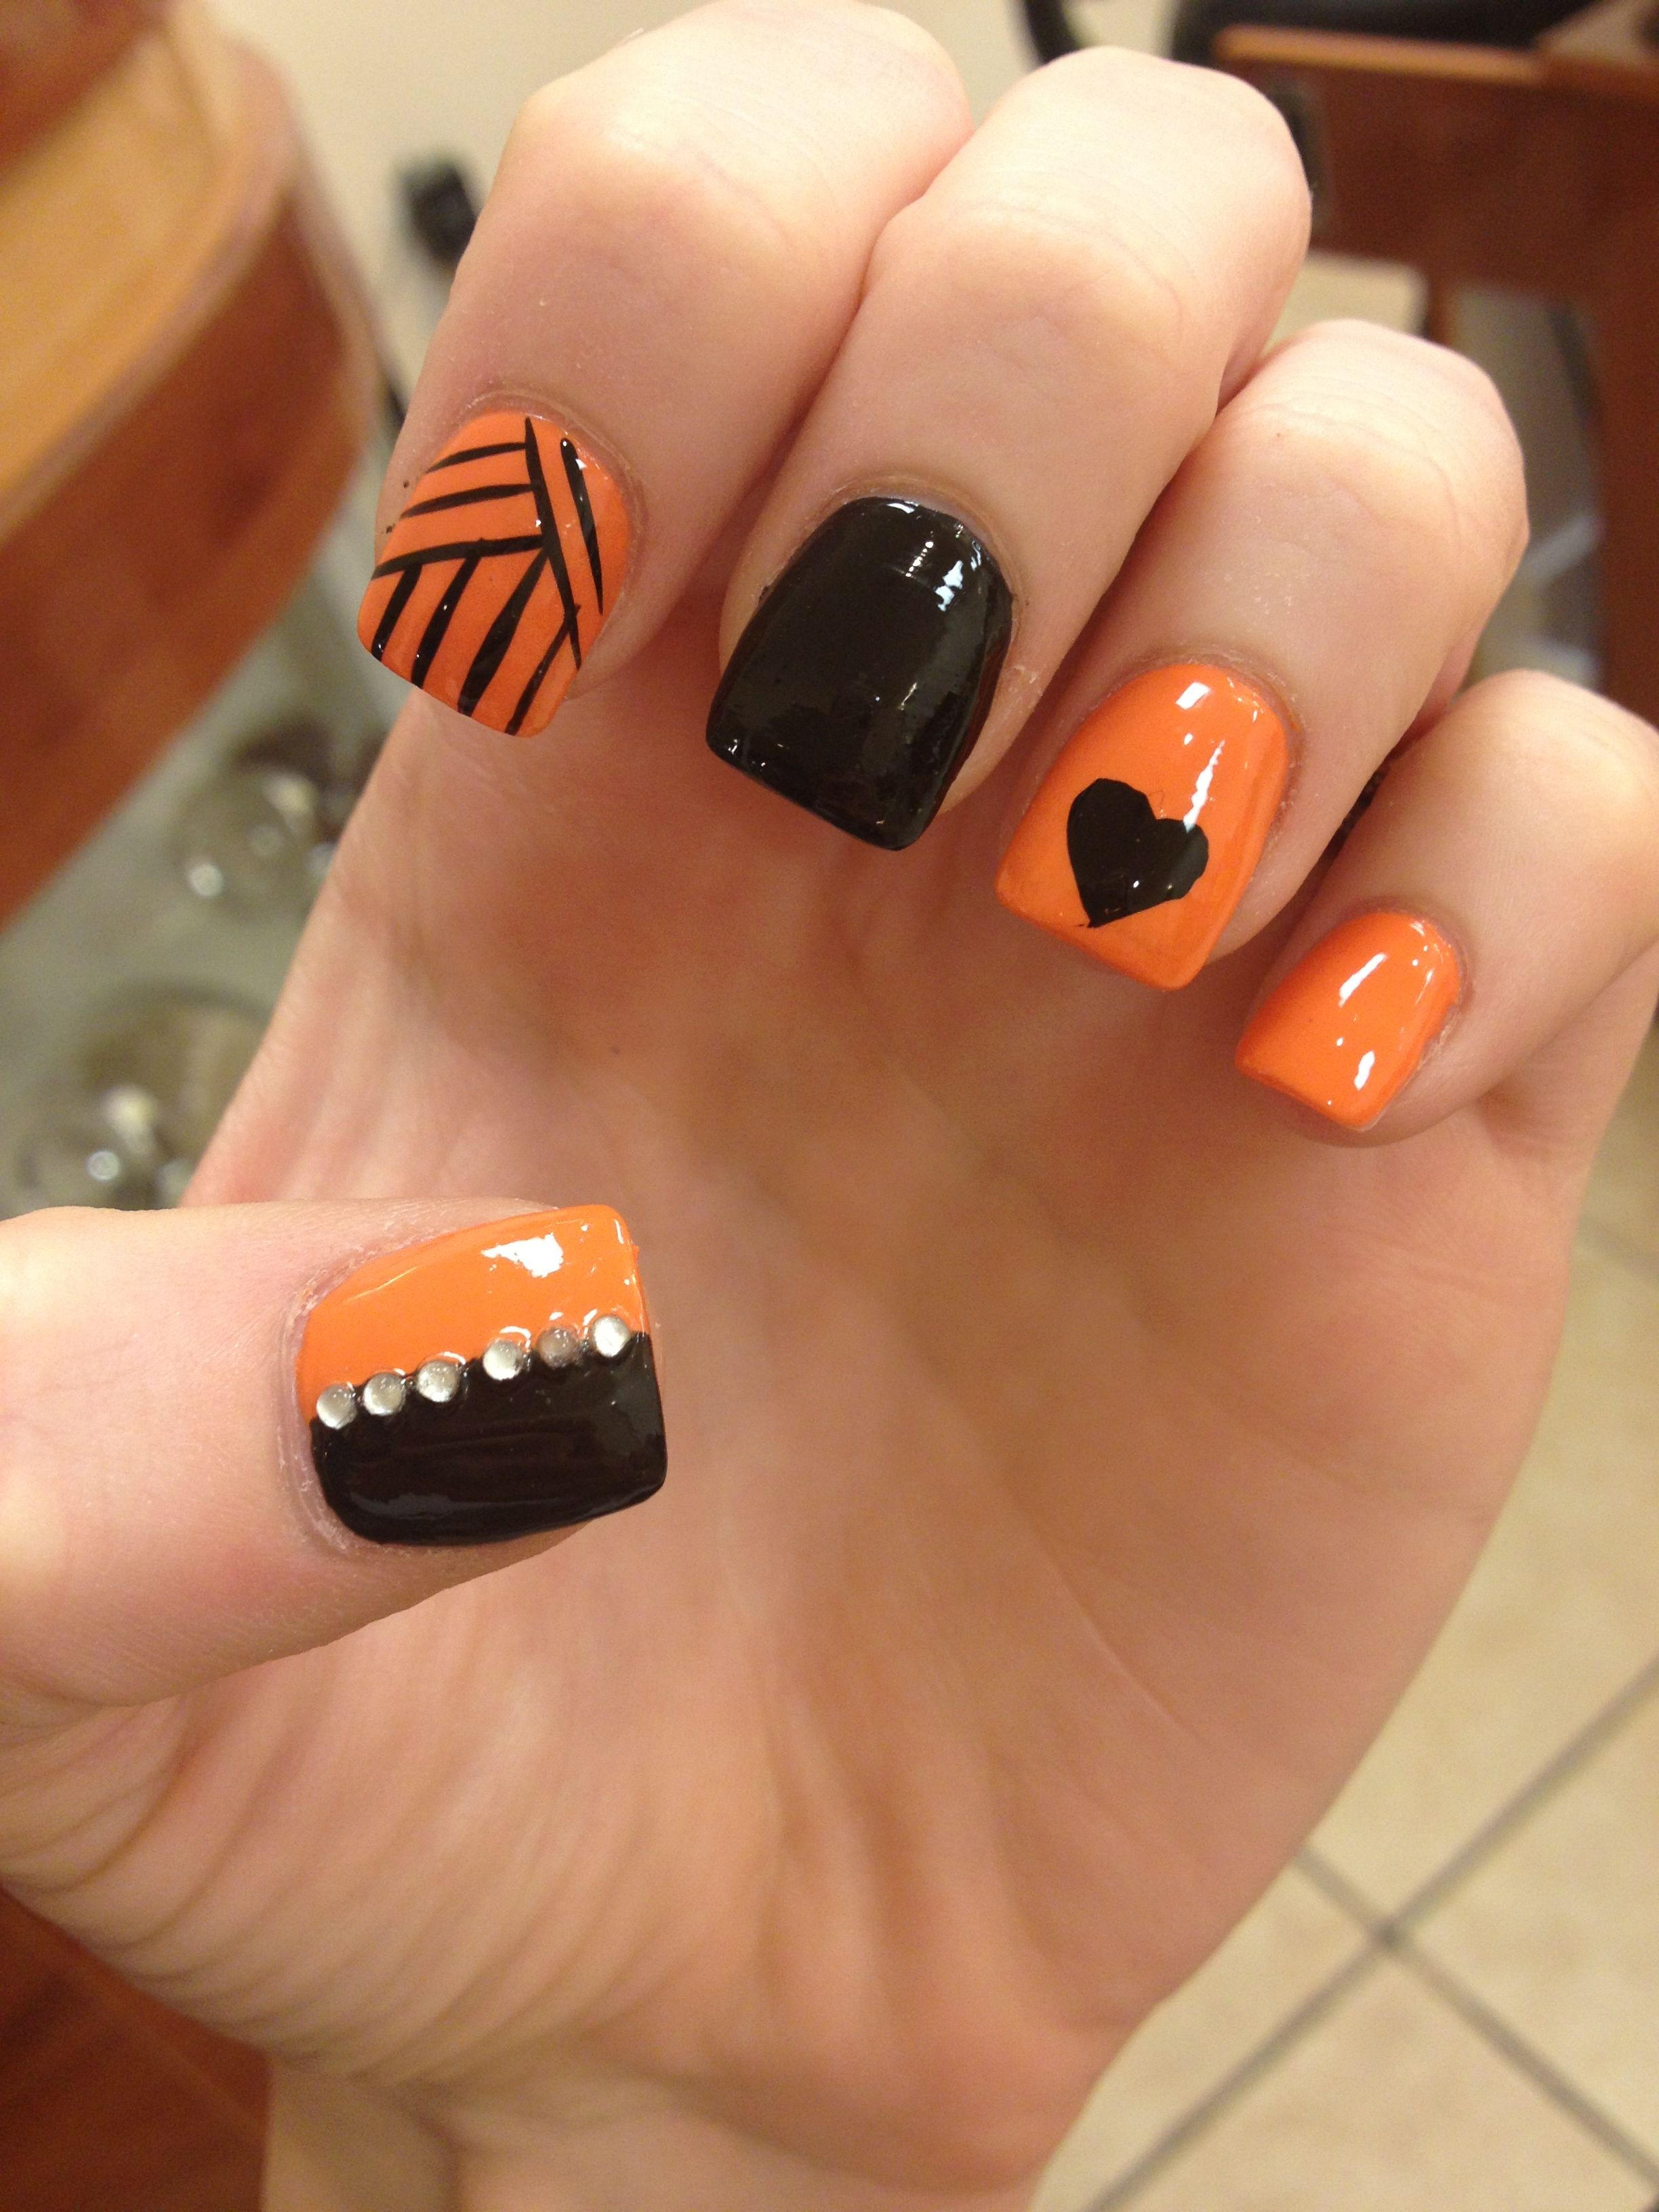 Orange And Black Nail Designs : orange, black, designs, Nails, Orange, Designs,, Black, Halloween